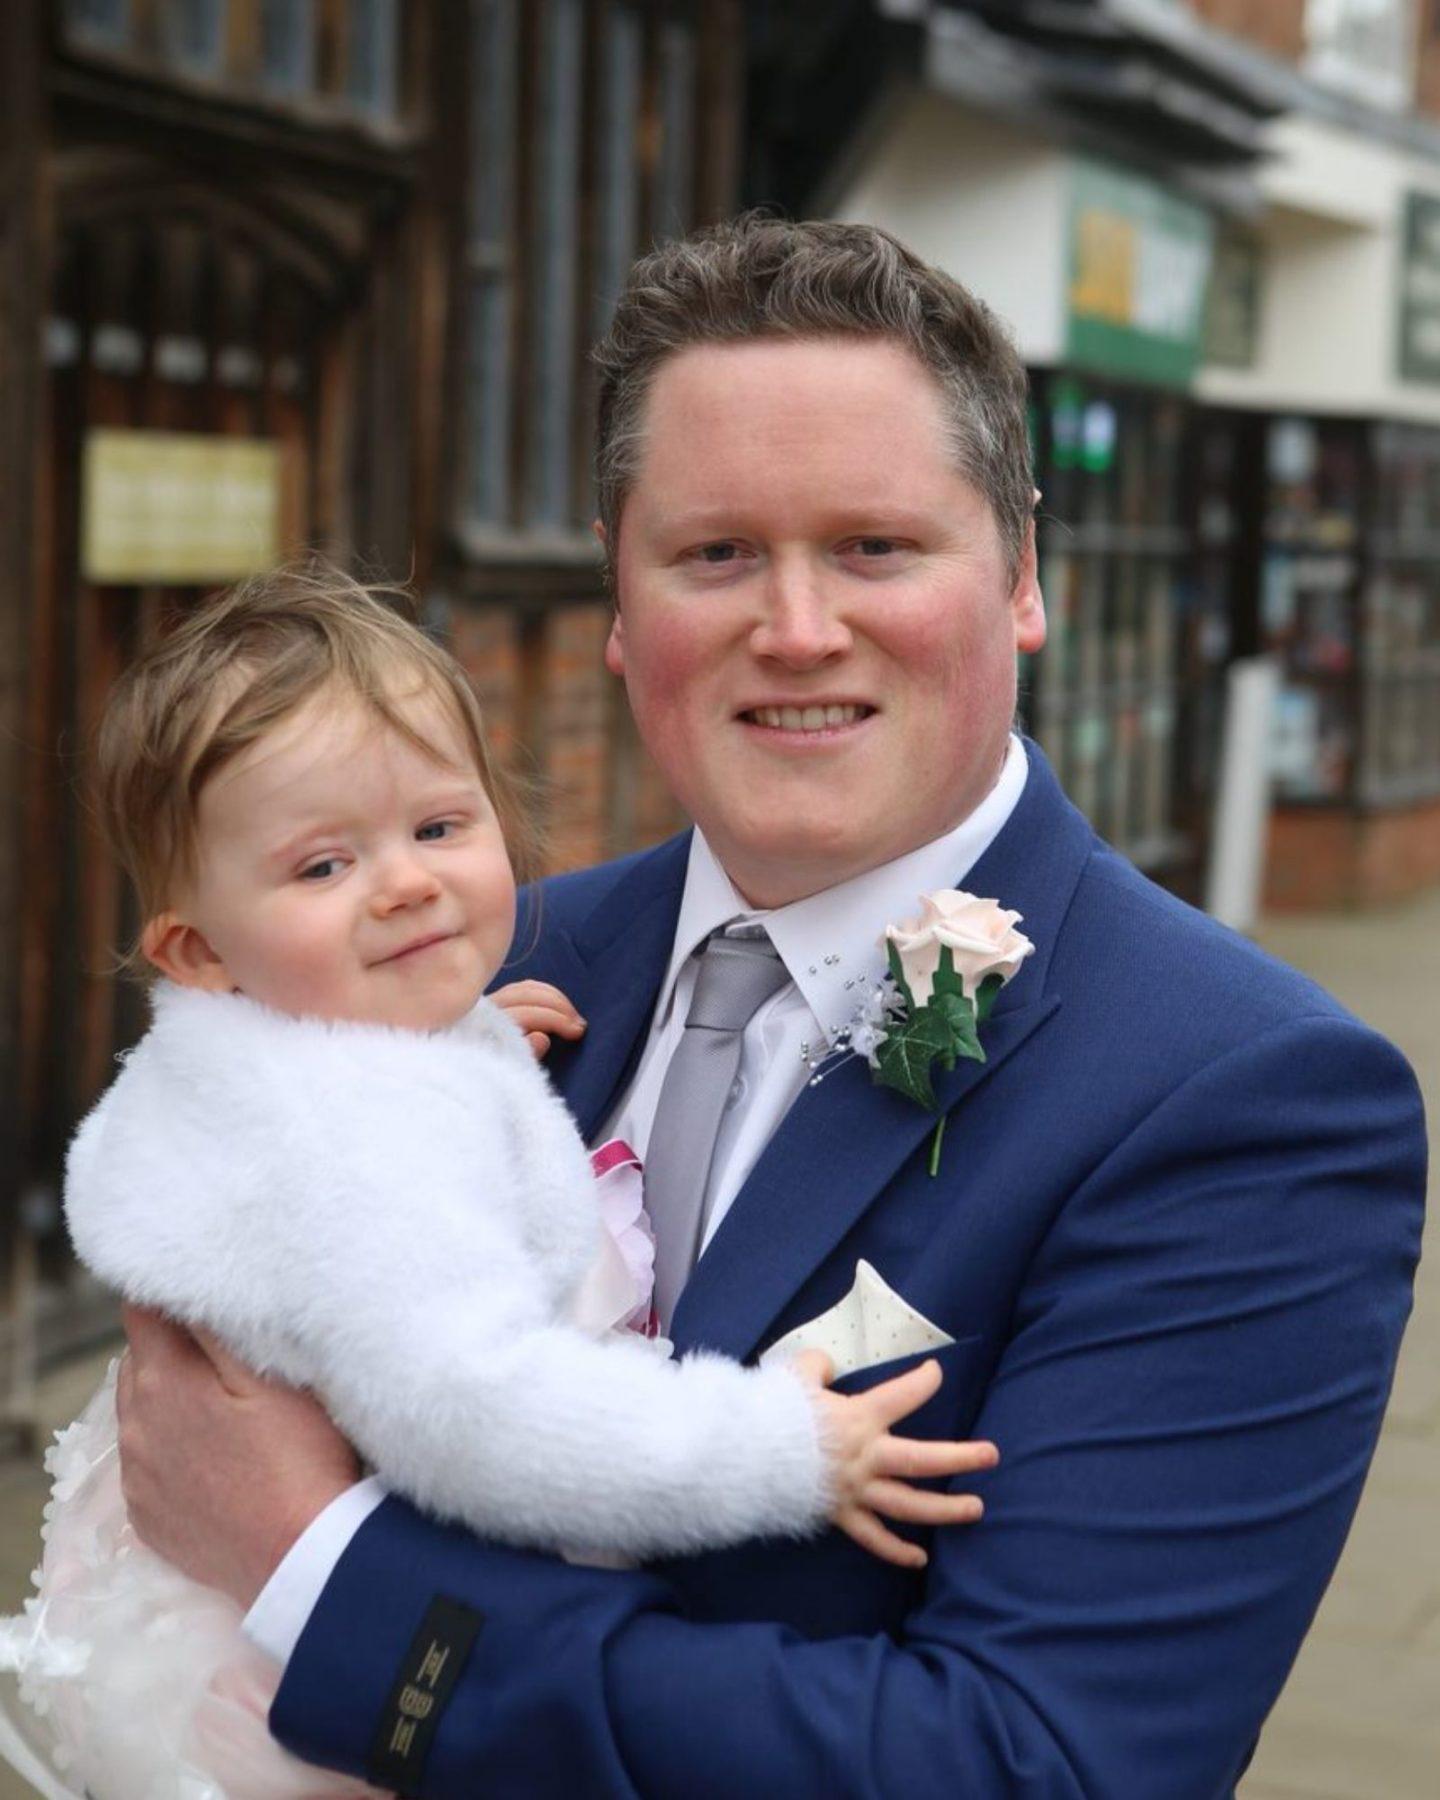 Covid pandemic wedding in UK